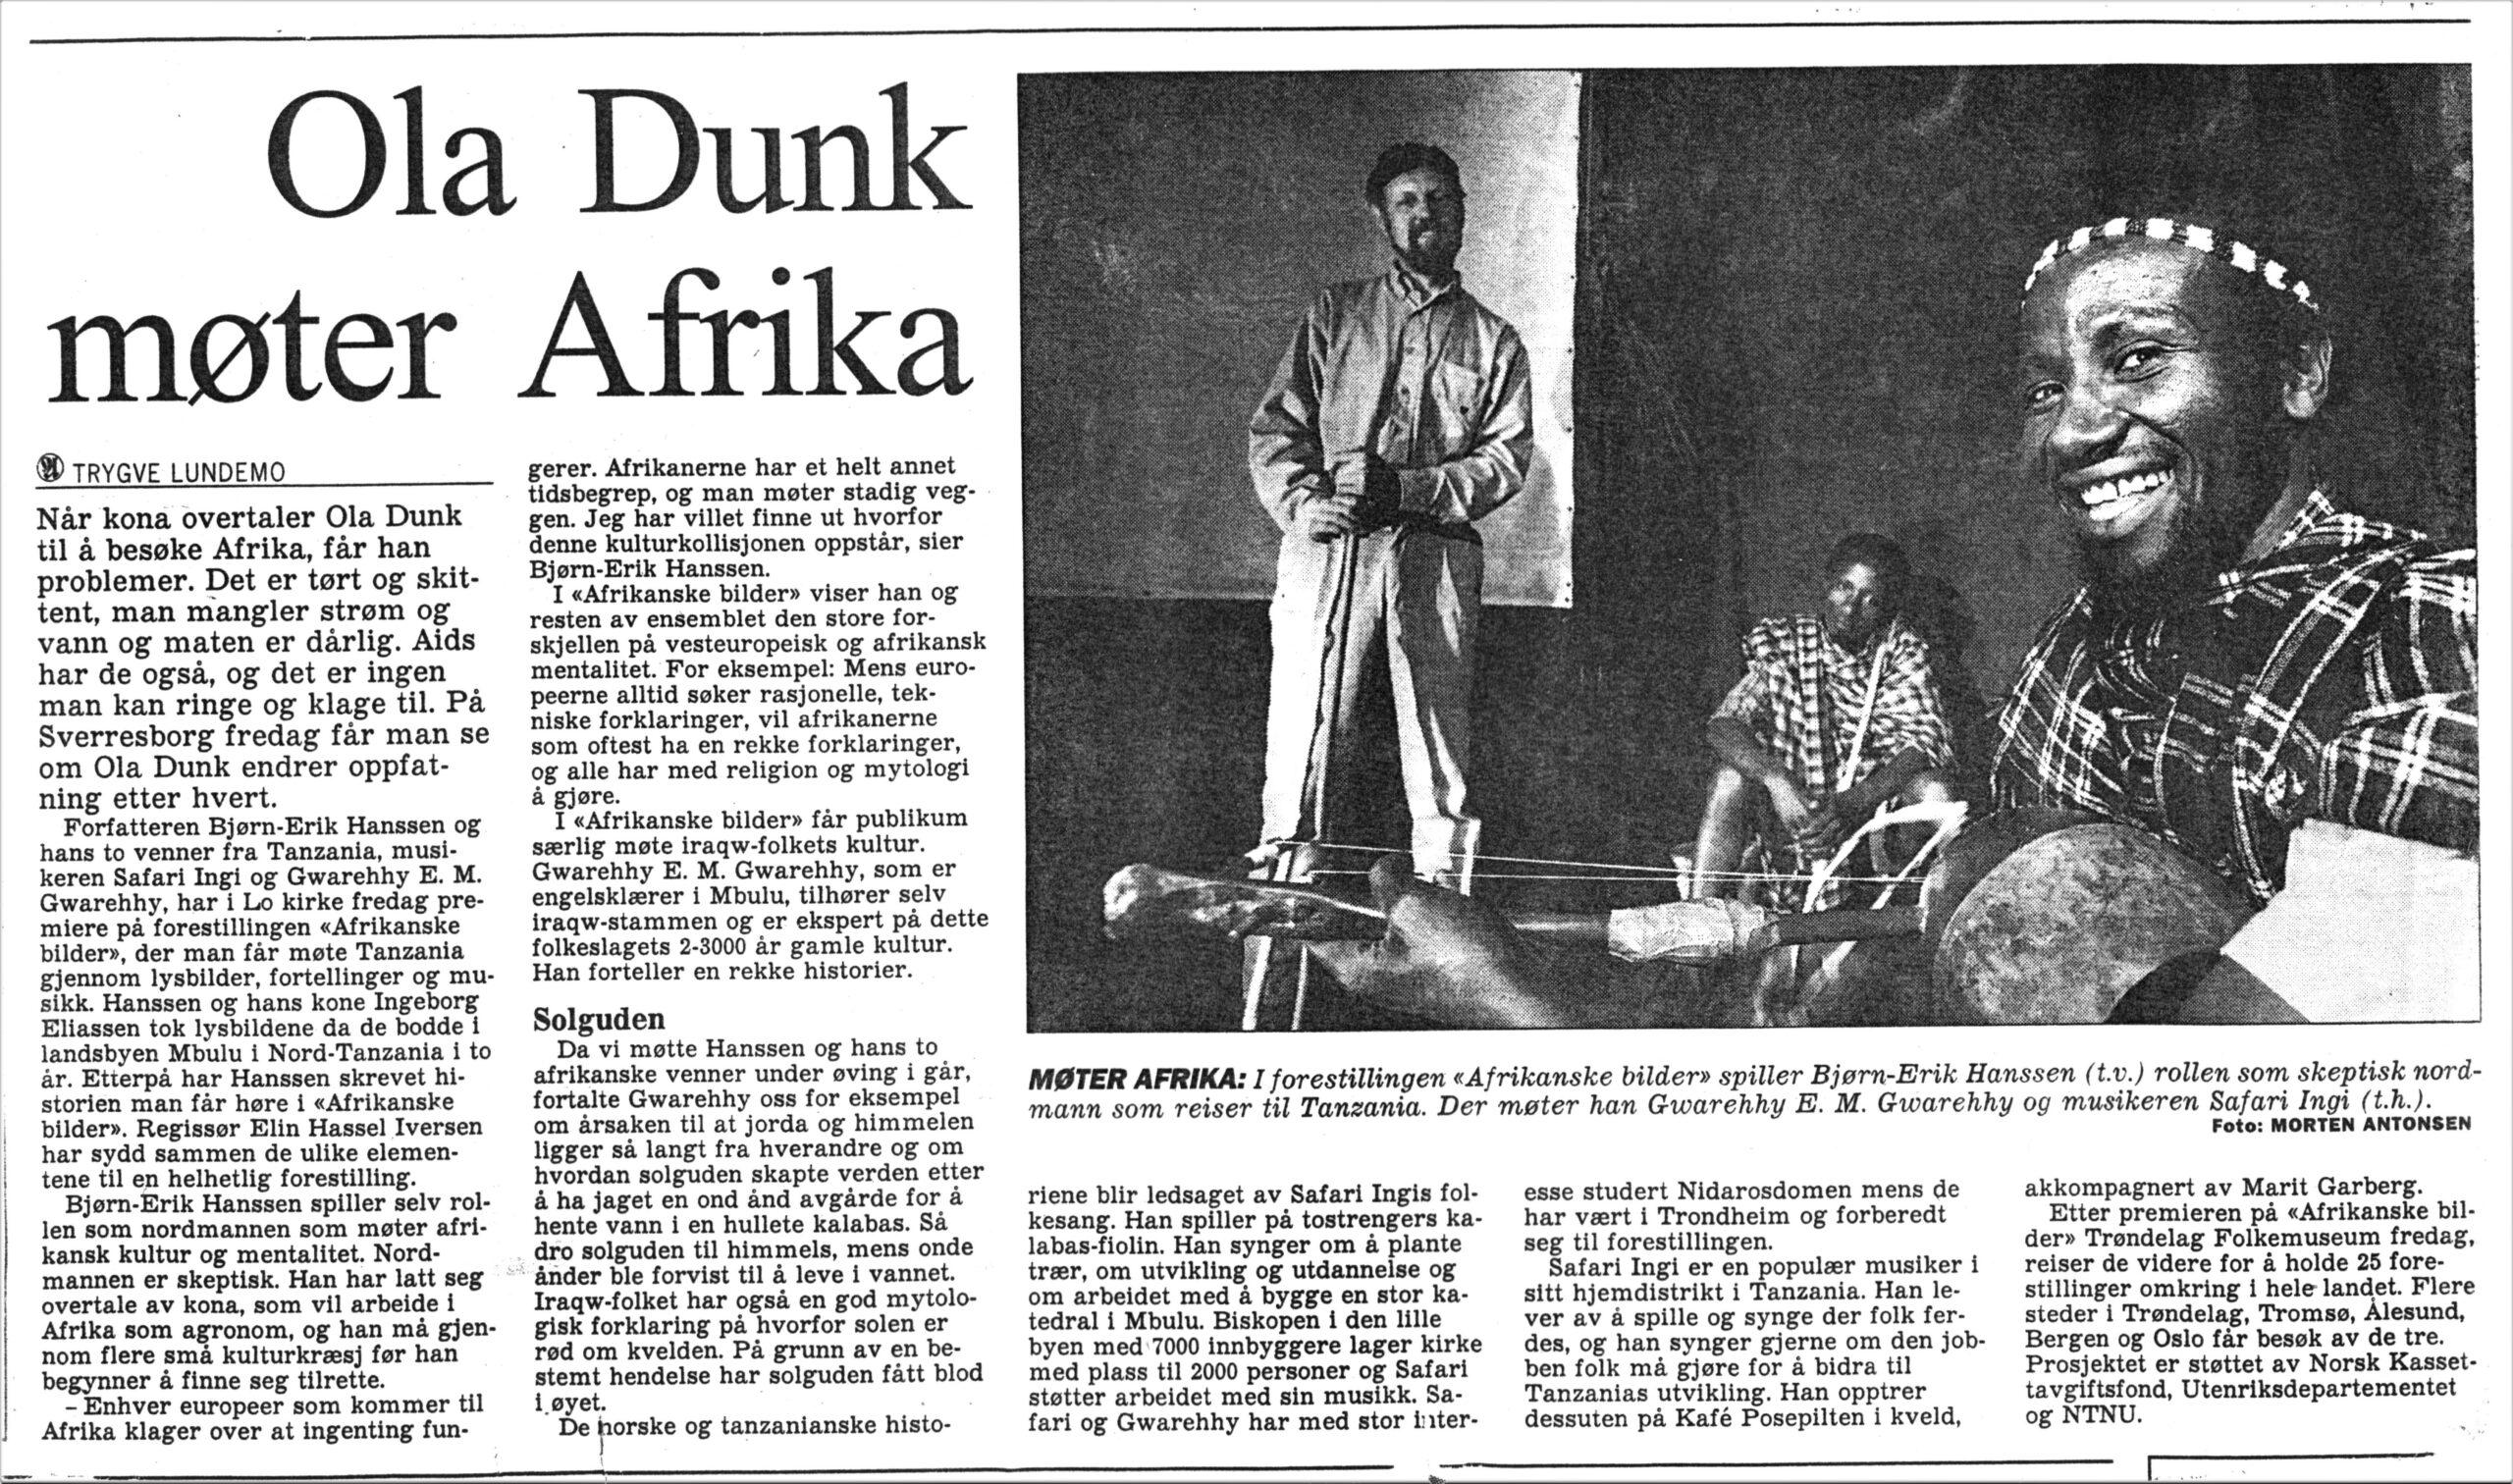 Ola Dunk møter Afrika (2)